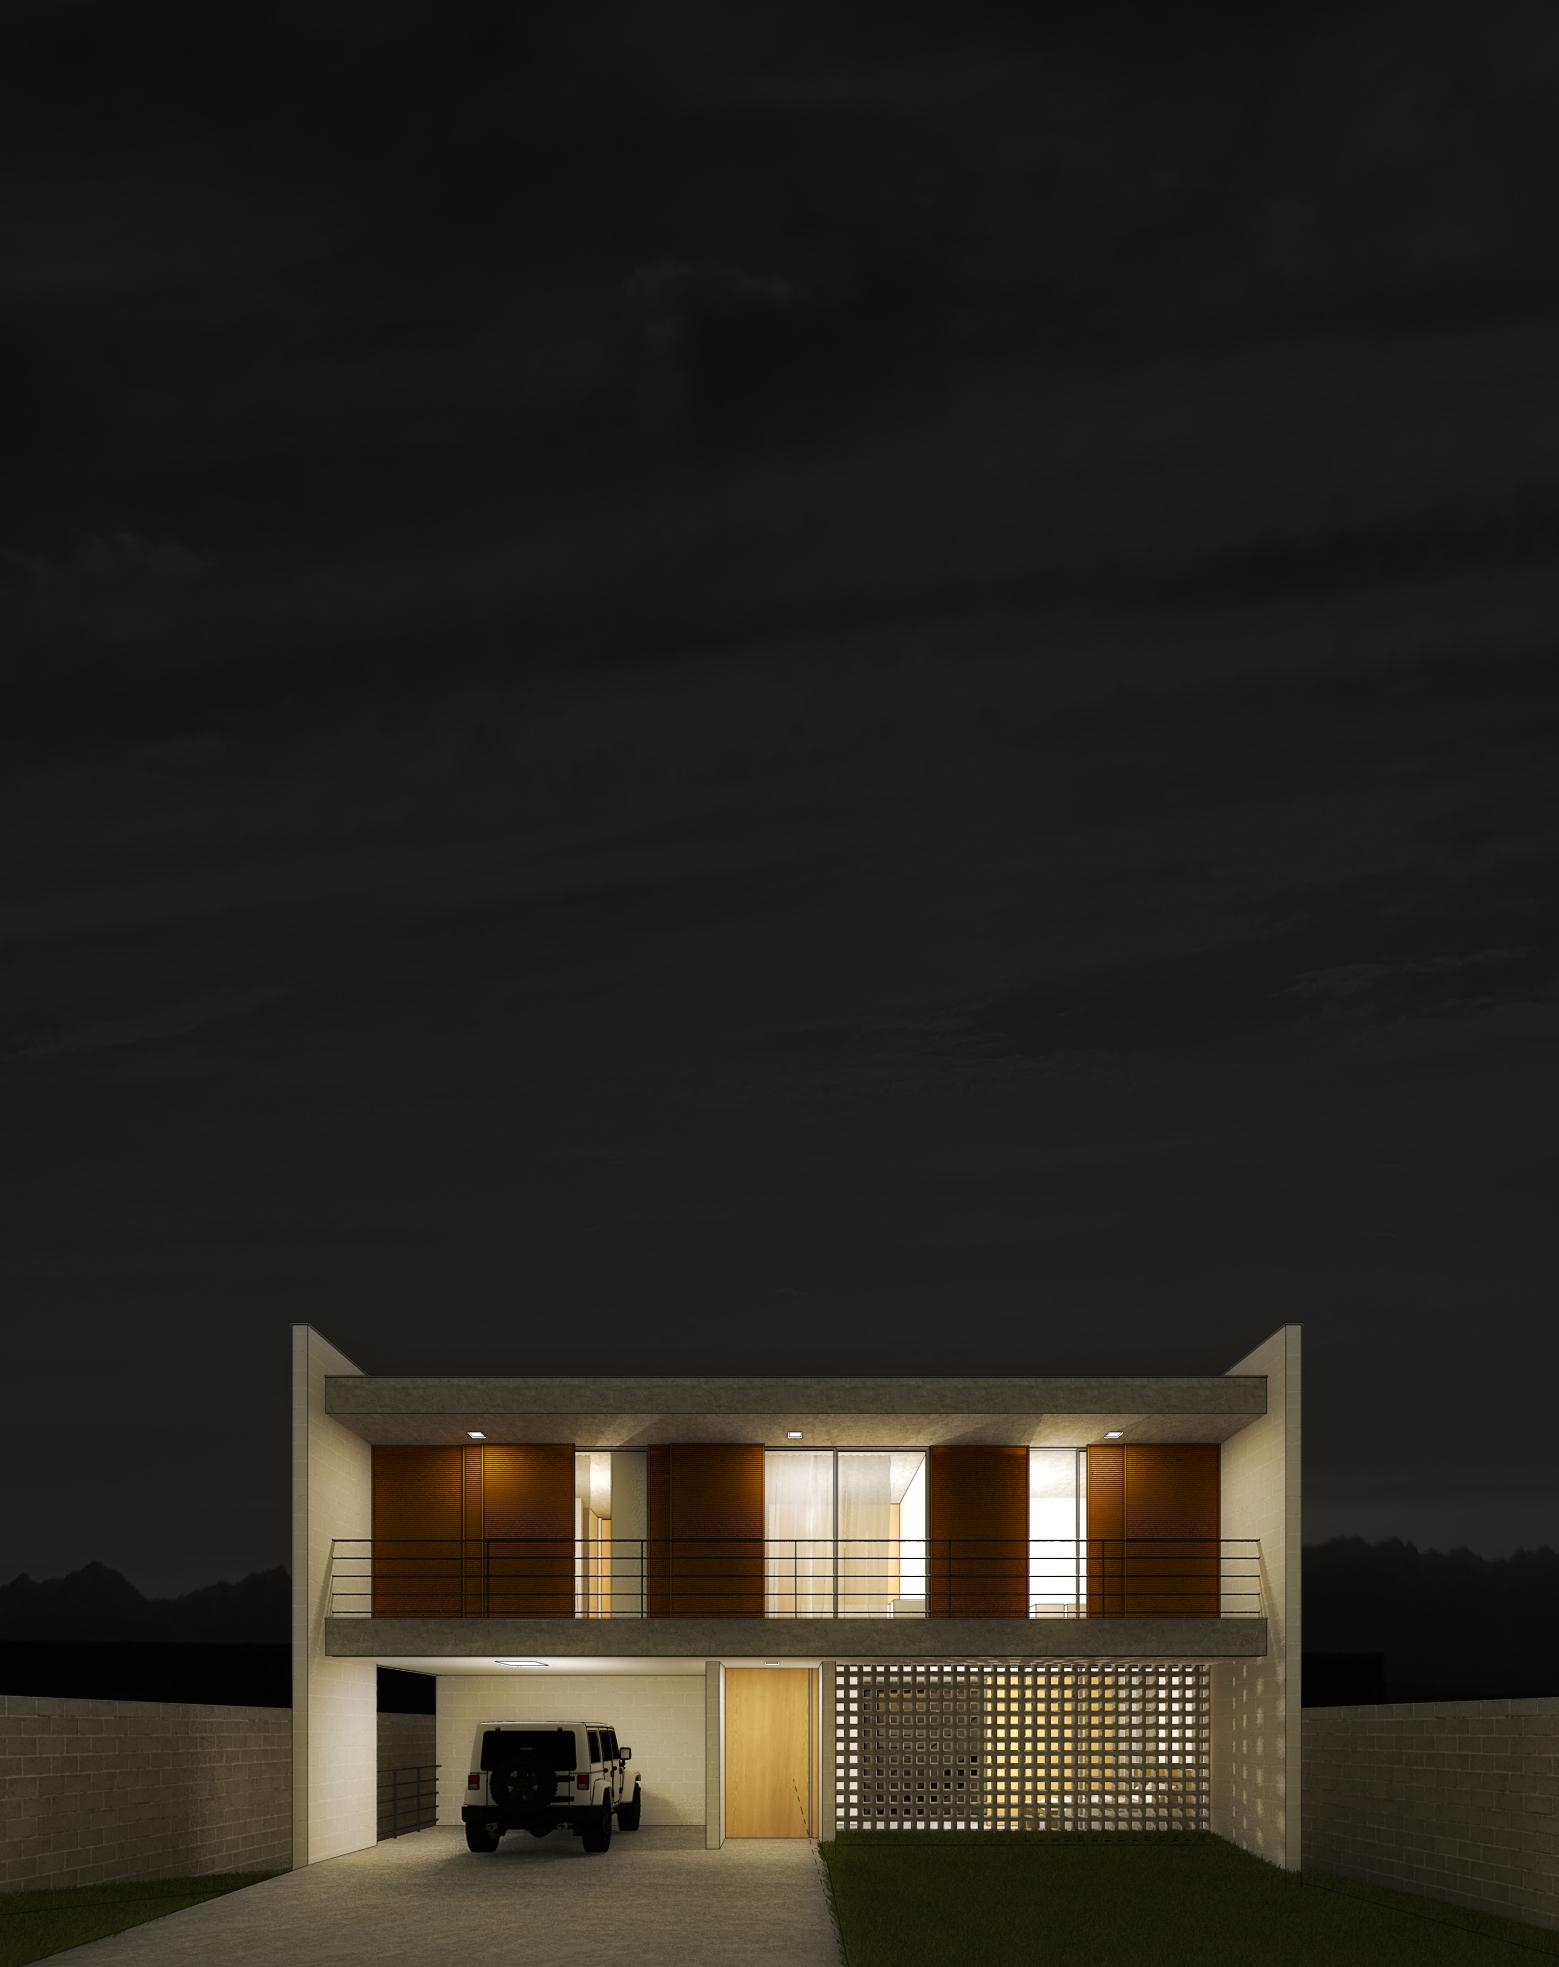 residencia-tn-daniel-carvalho-arquiteto-9